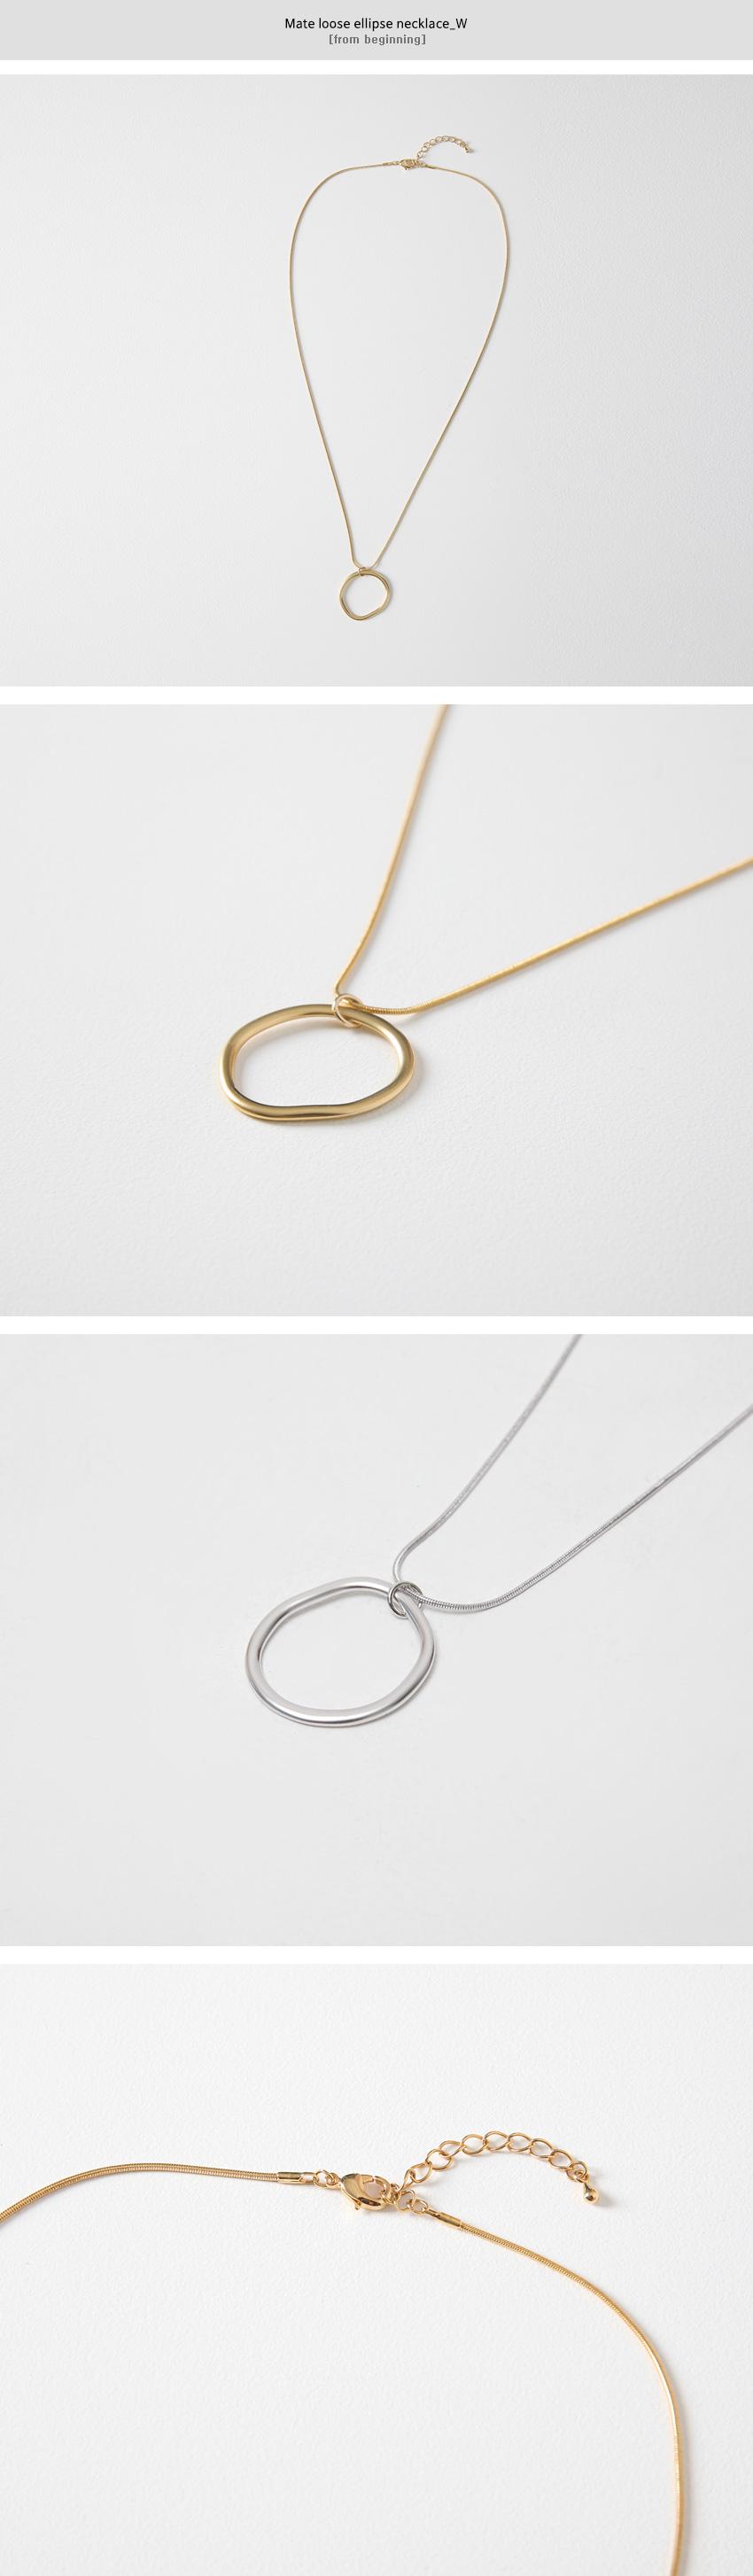 Mate loose ellipse necklace_W